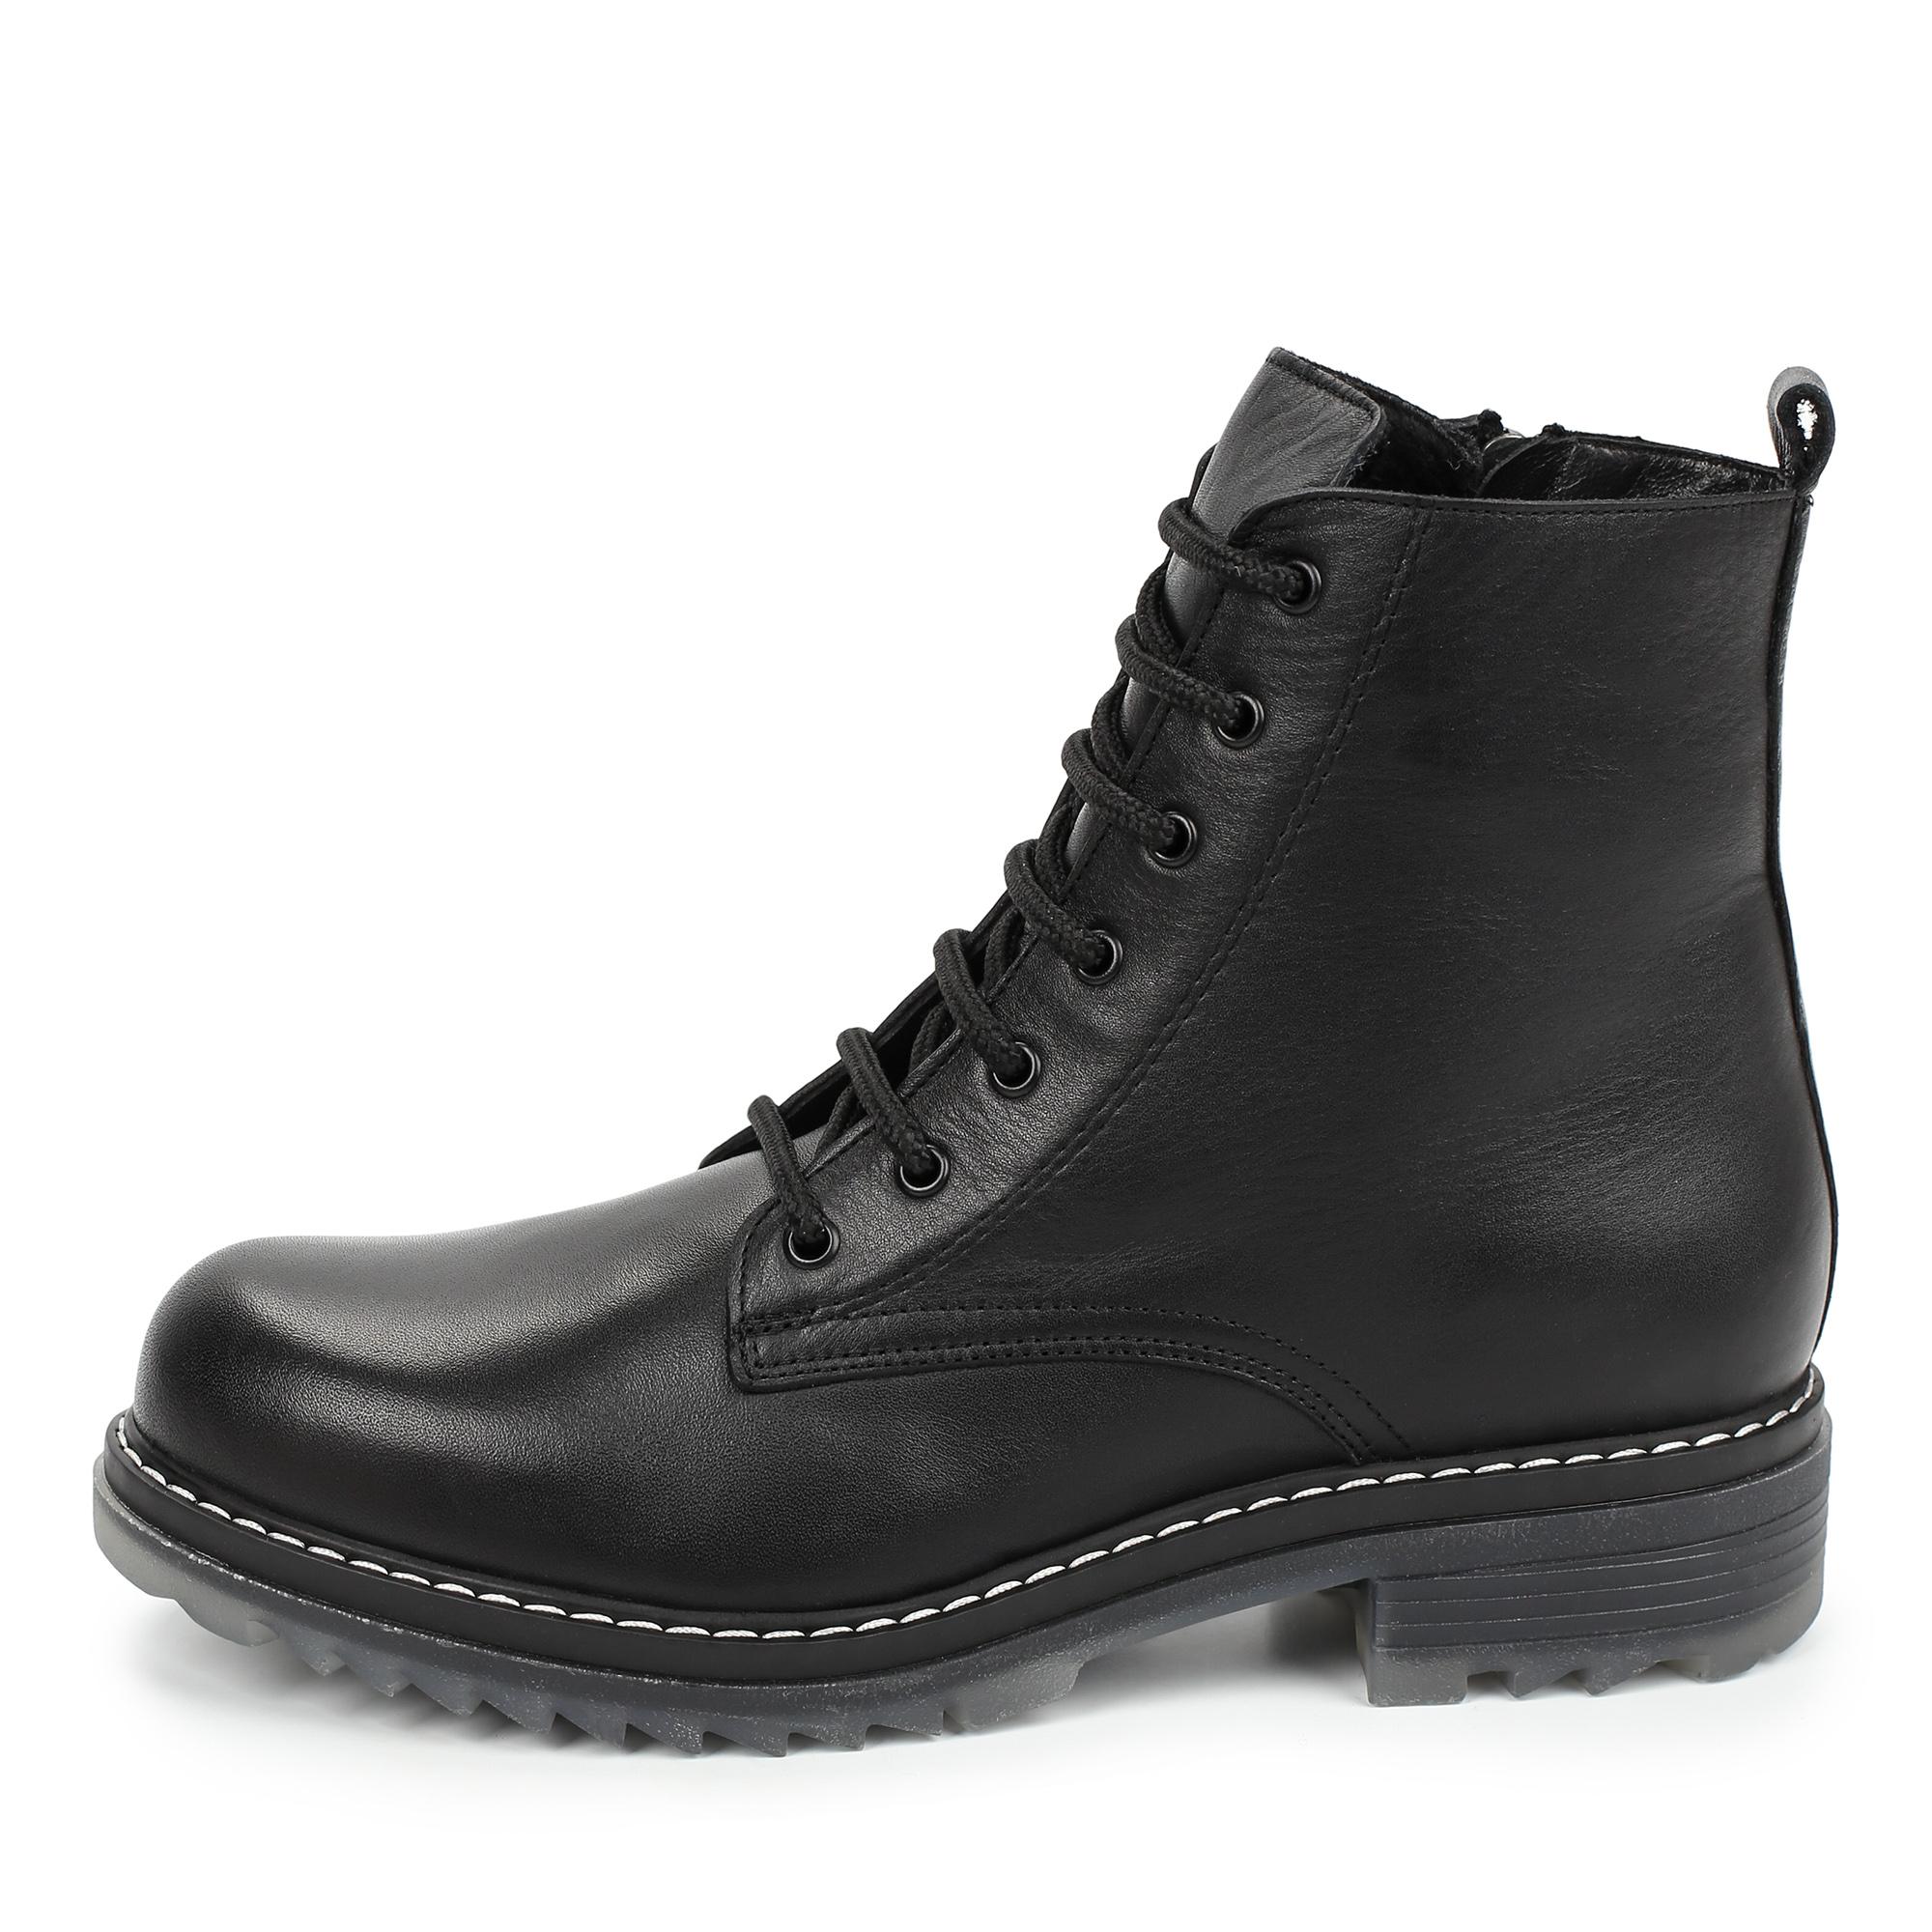 Ботинки Thomas Munz 506-005A-2102